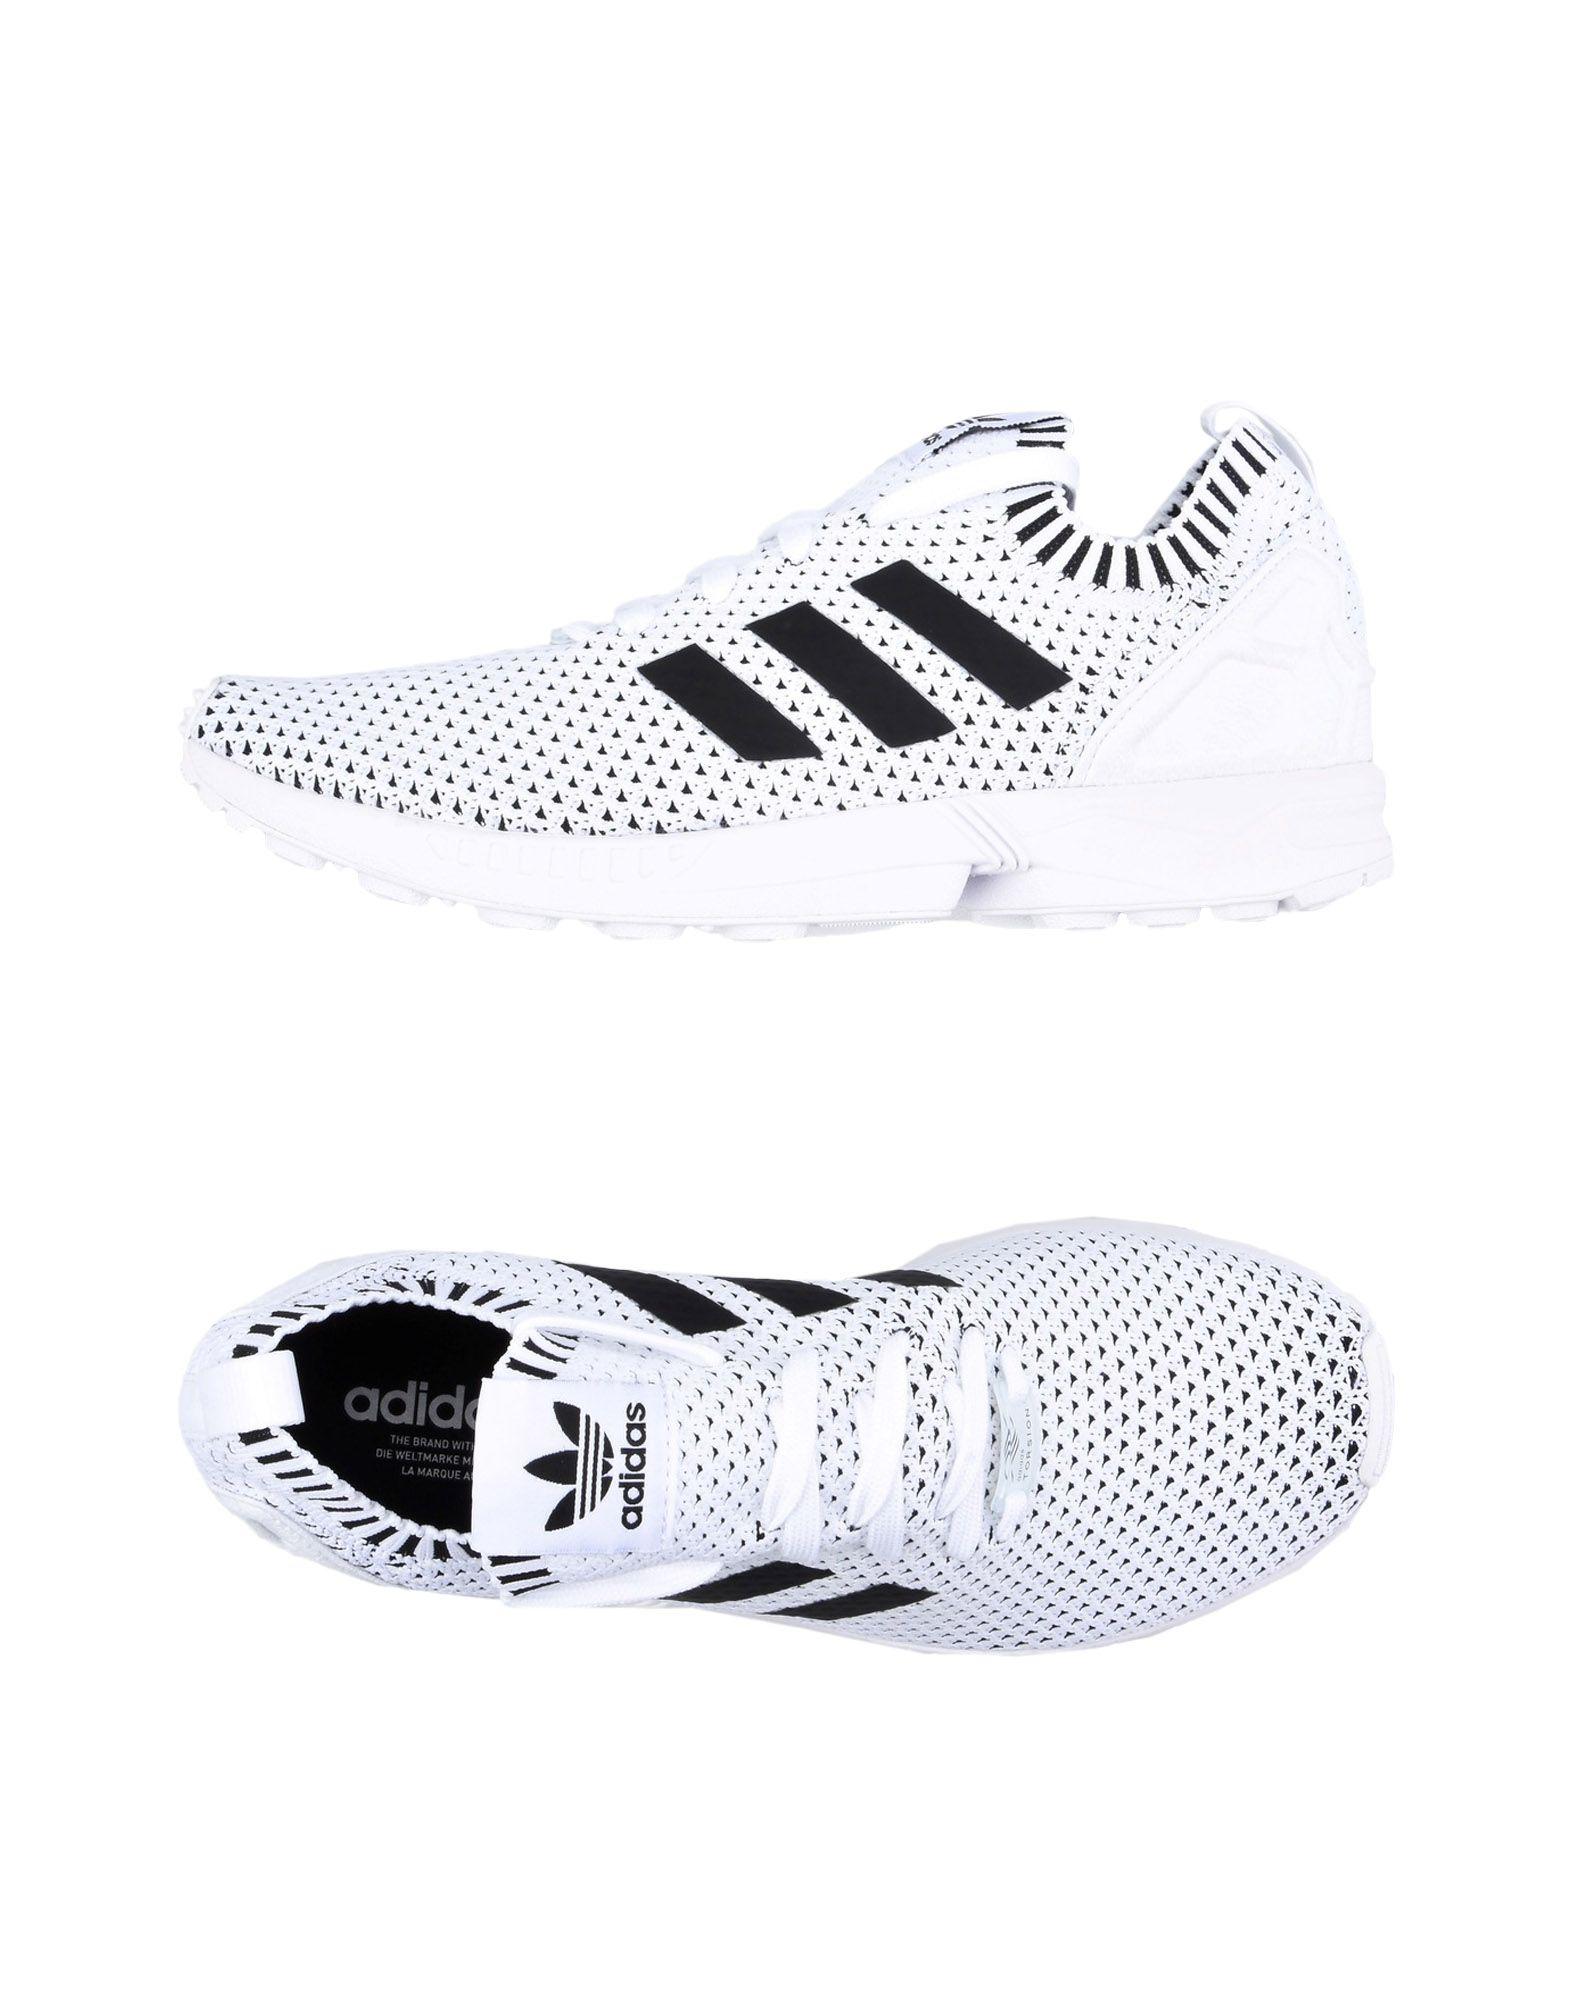 Adidas Originals Zx Flux Pk - Sneakers Sneakers Sneakers - Men Adidas Originals Sneakers online on  United Kingdom - 11262573NW 9864f9